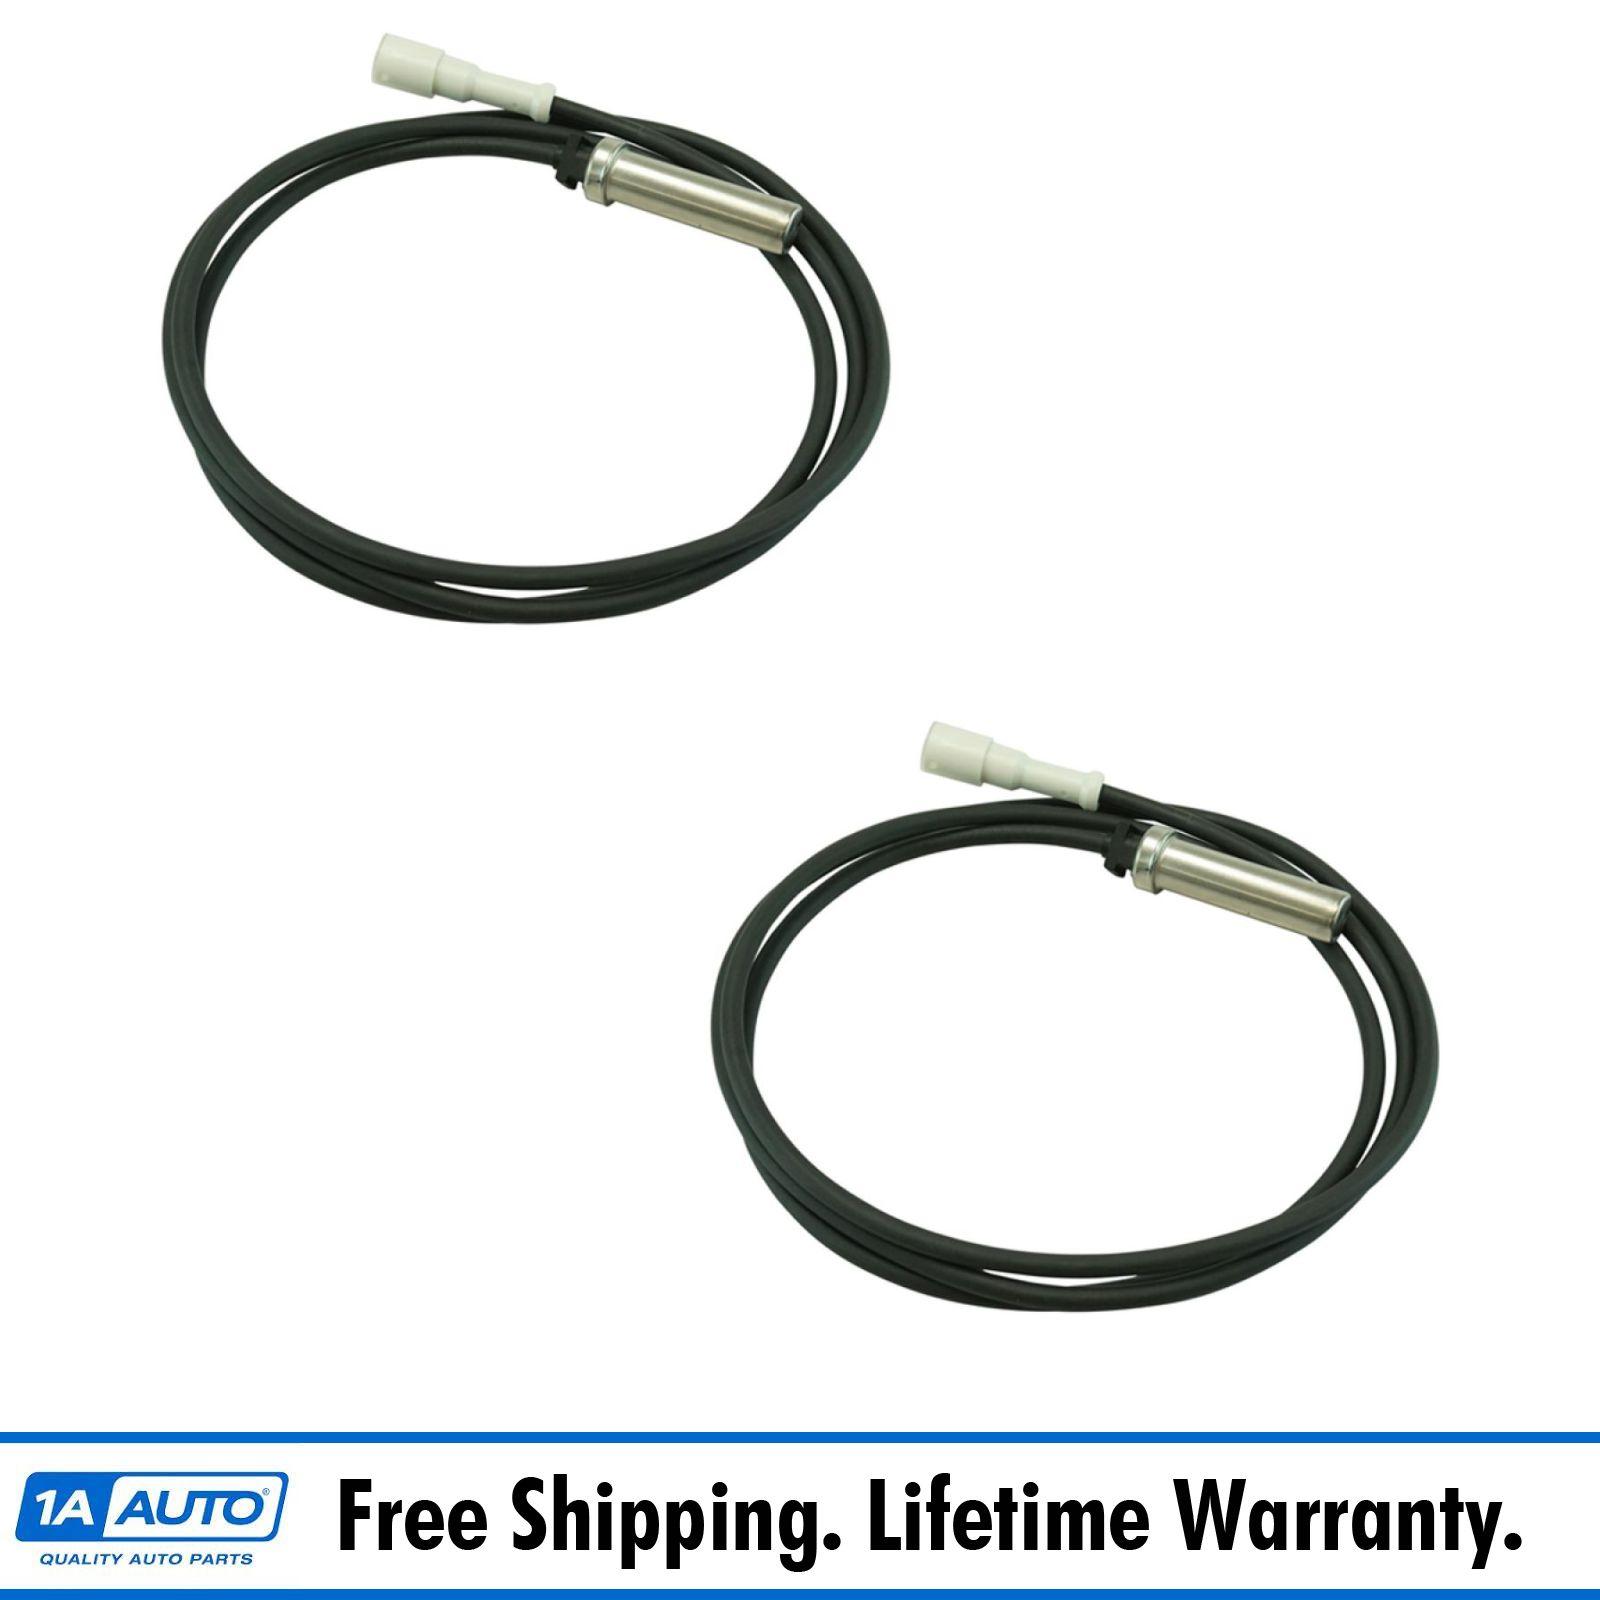 Details about Dorman Anti-Lock ke System ABS Sensor Pair Front Rear on